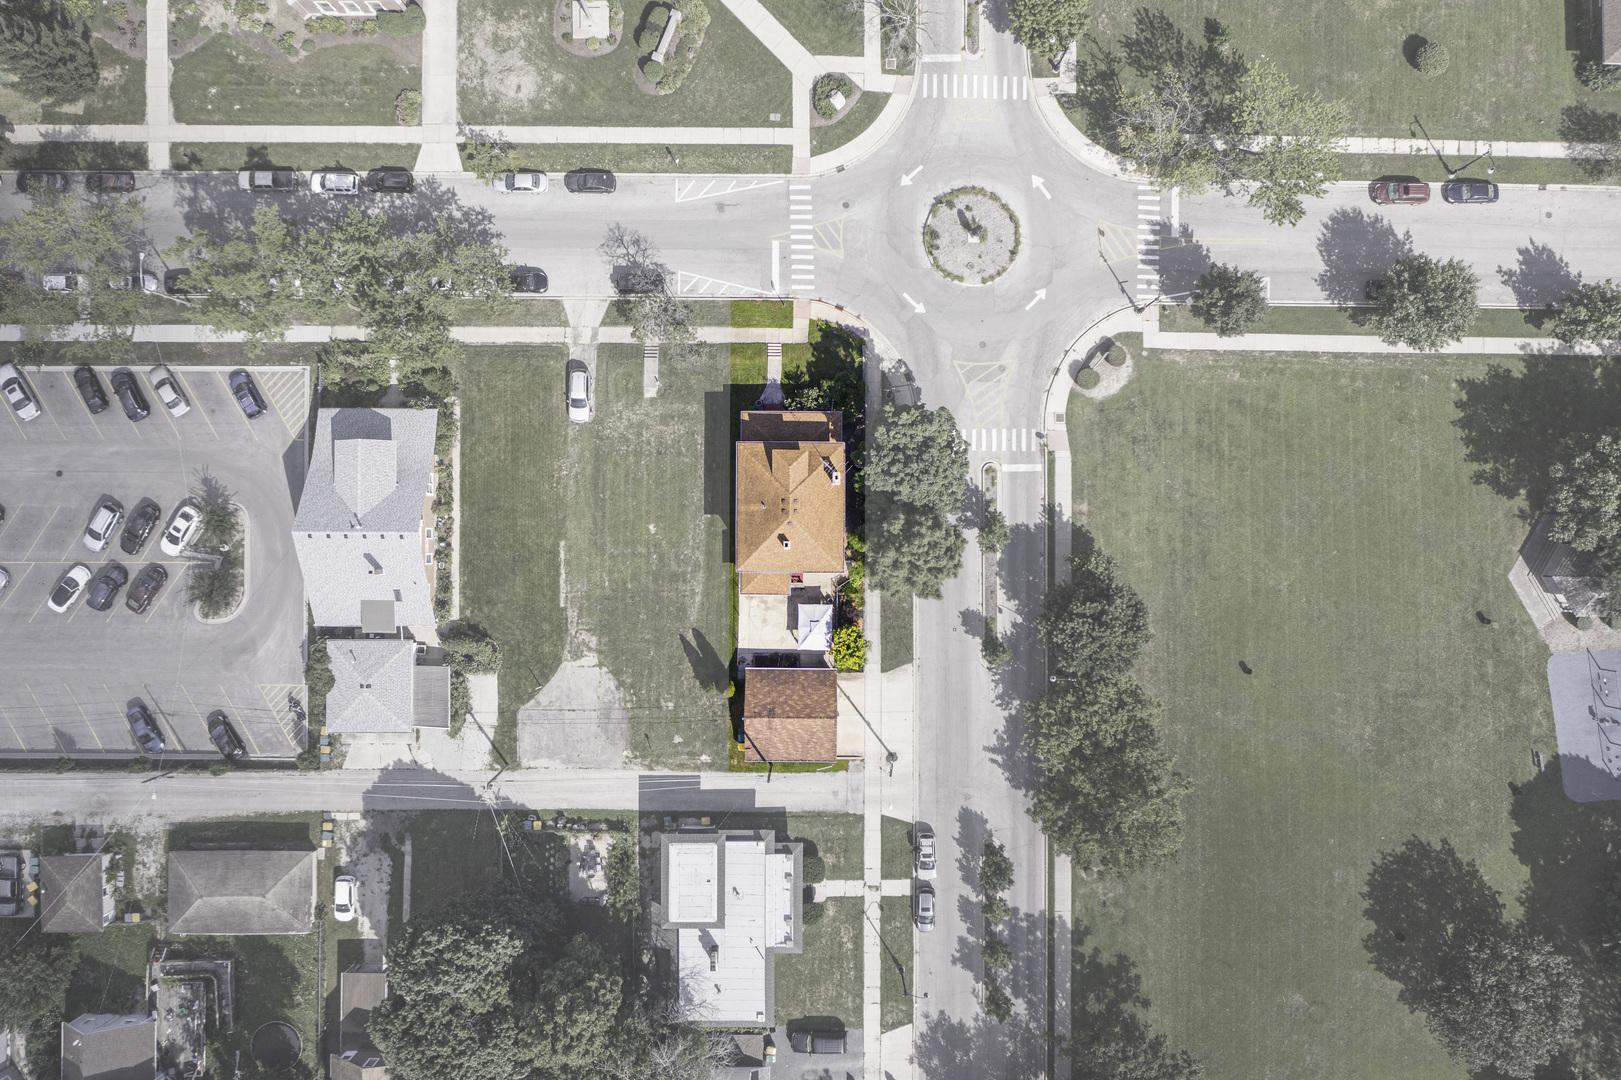 501 Wilcox, Joliet, Illinois, 60435